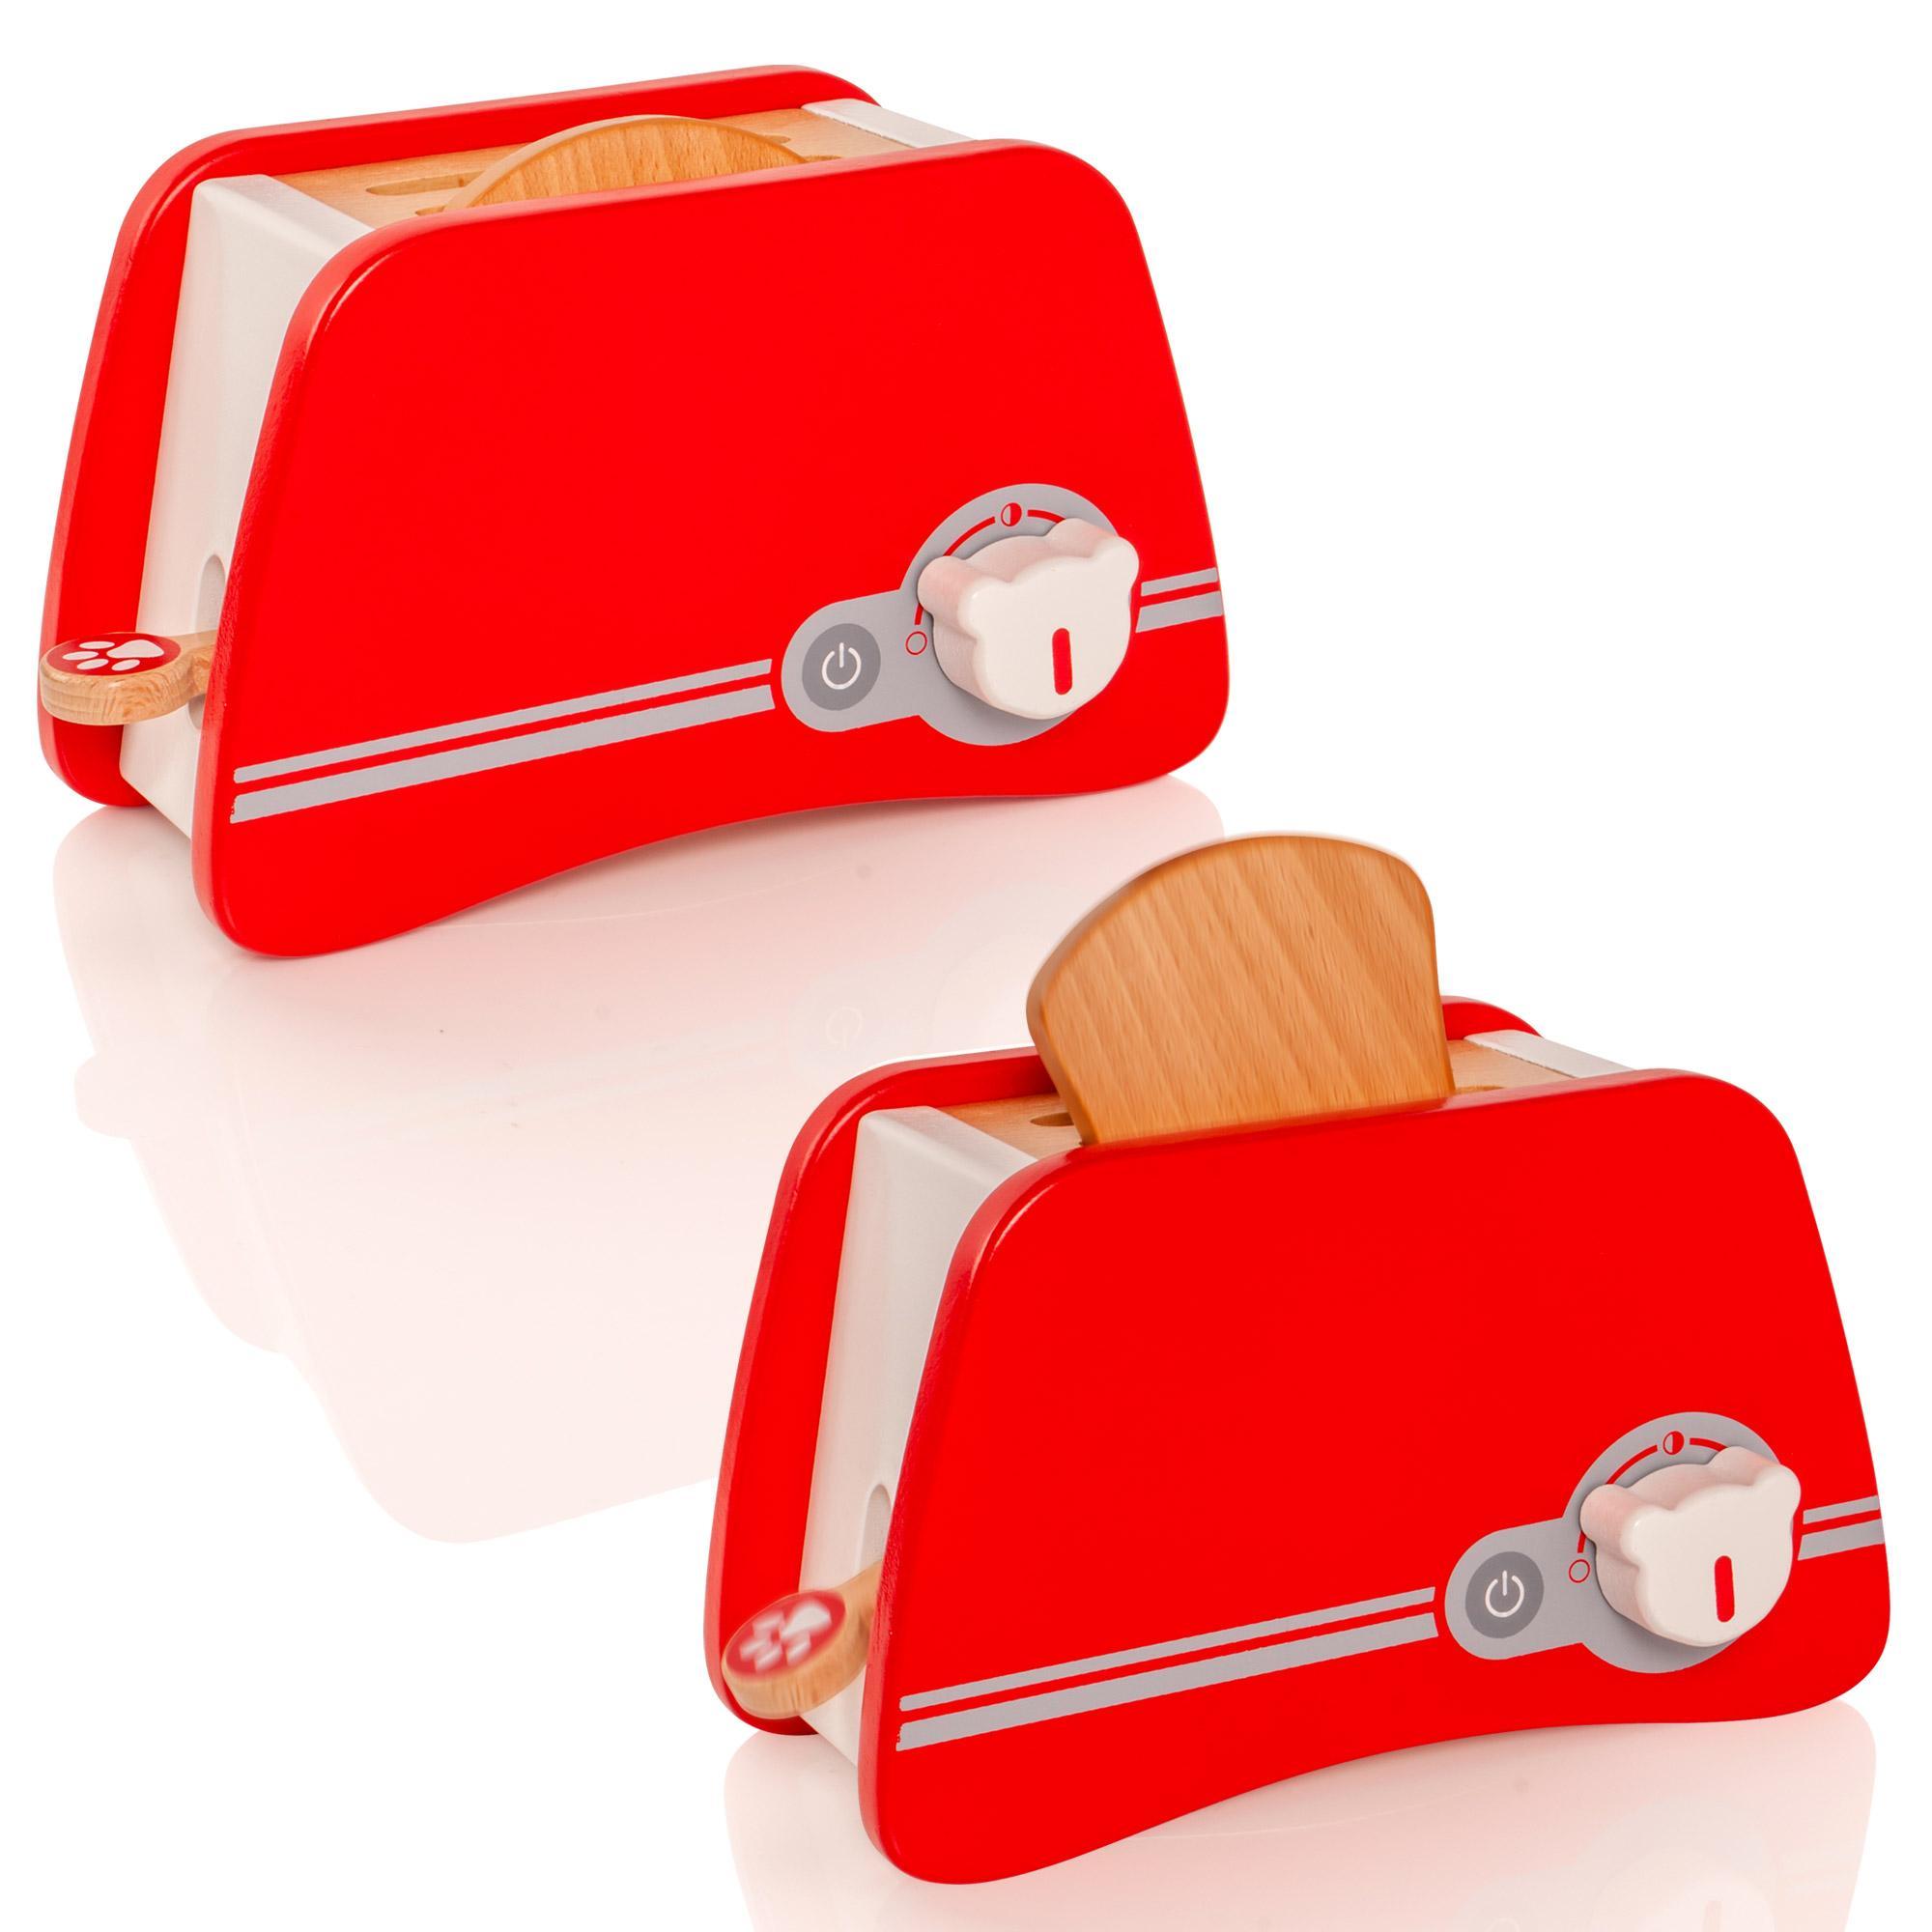 Kitchen Play Set Accessories Toaster